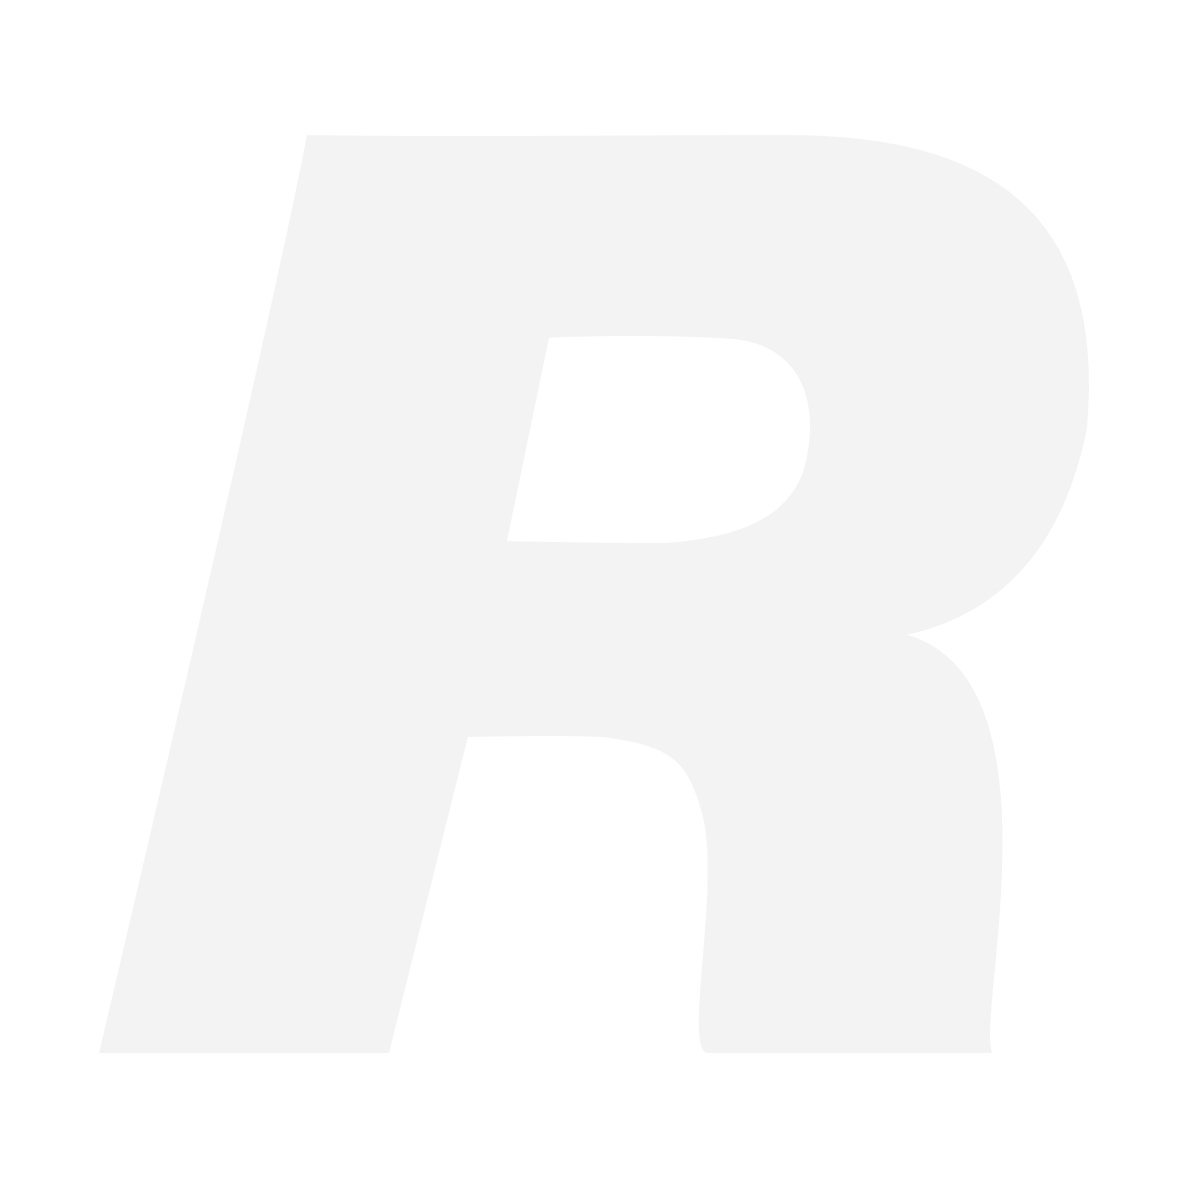 BLACK RAPID ARCA-SWISS 50 PLATE